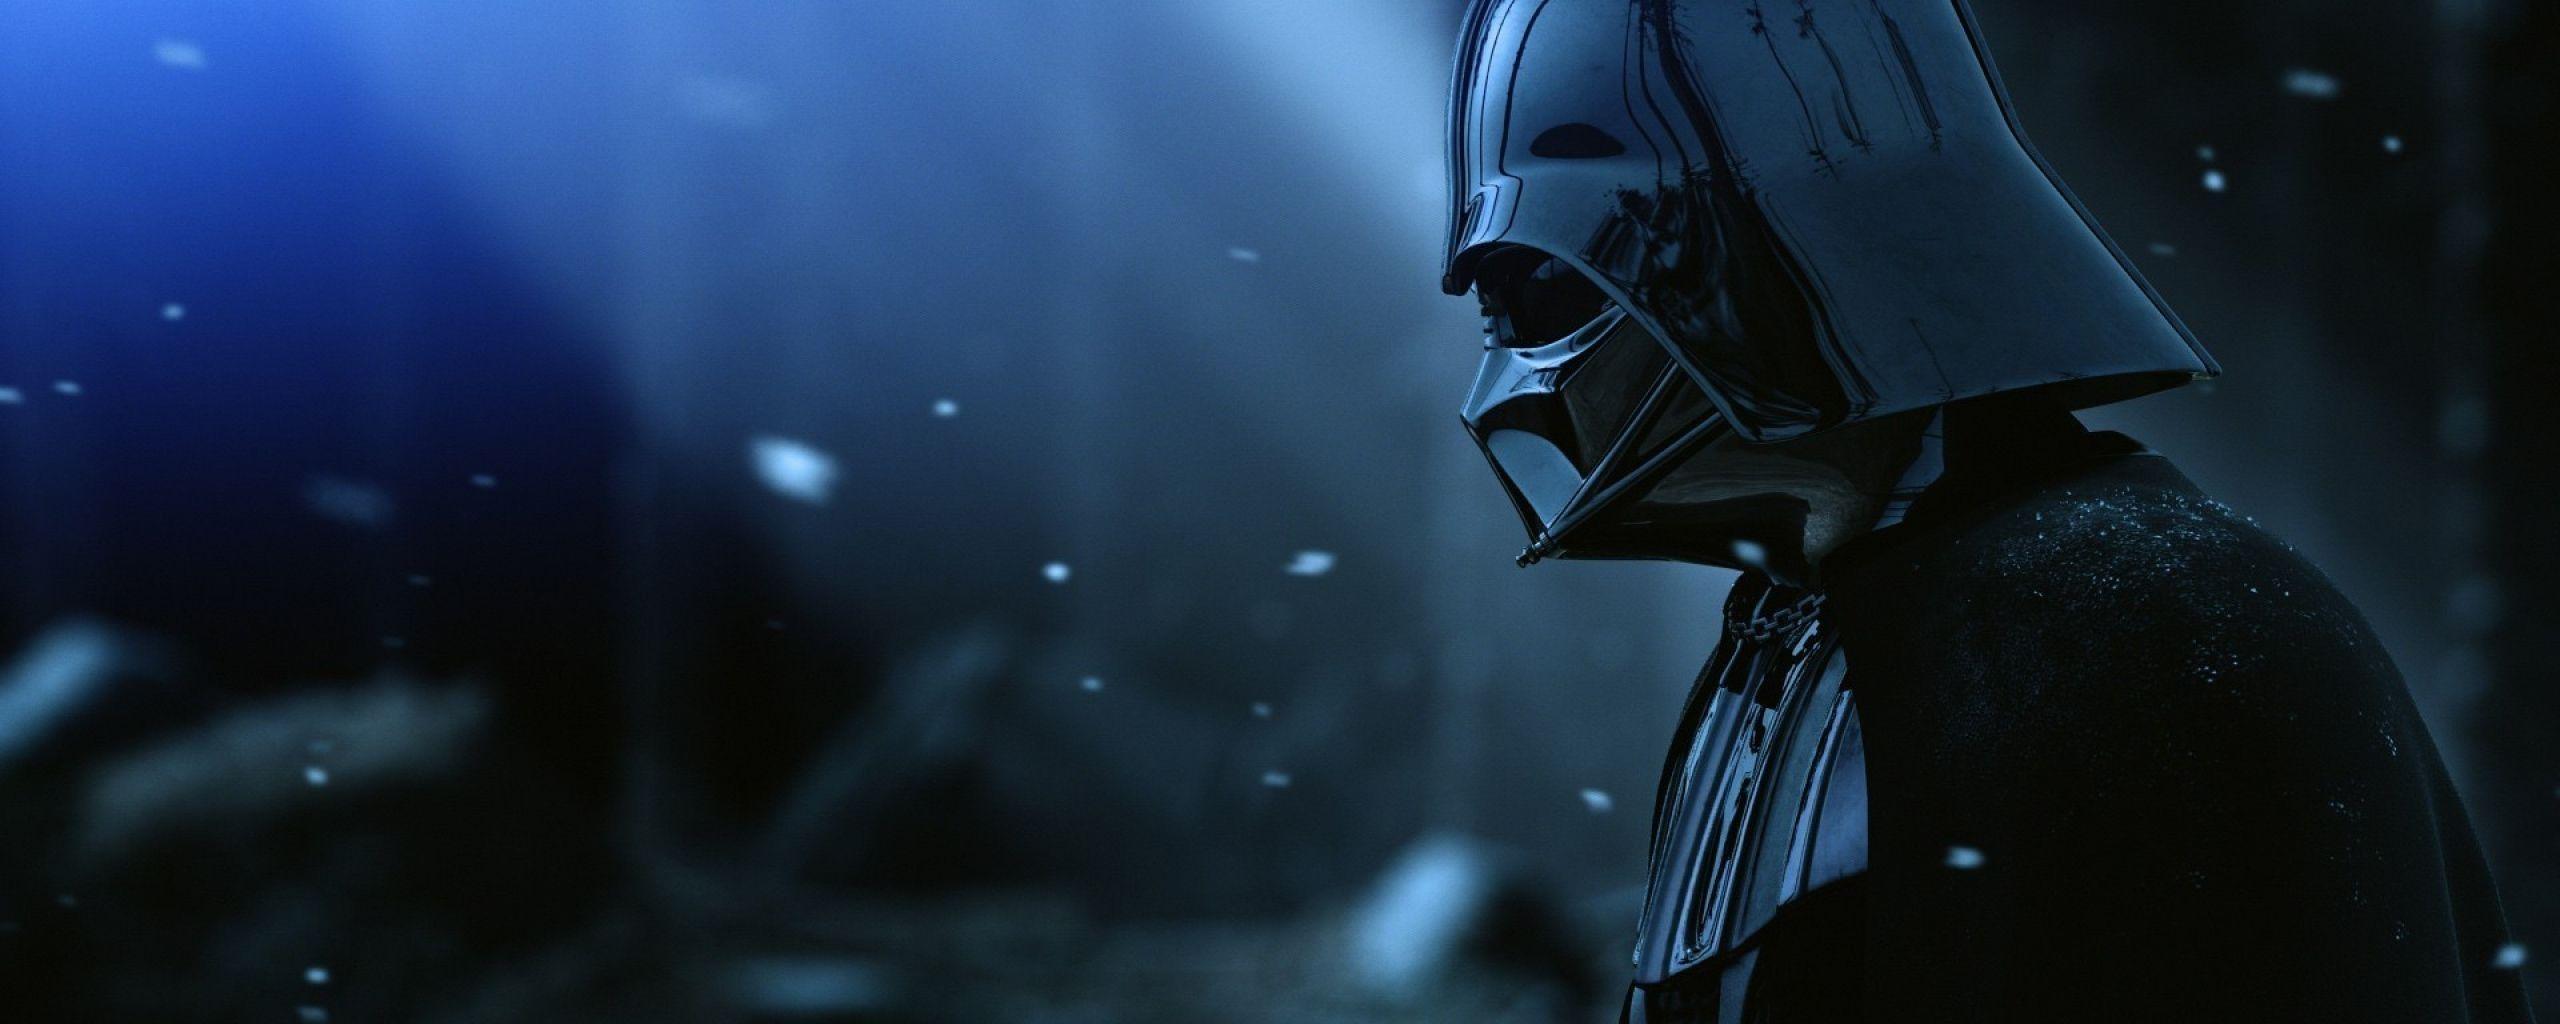 Star Wars Dual Monitor Wallpapers Top Free Star Wars Dual Monitor Backgrounds Wallpaperaccess